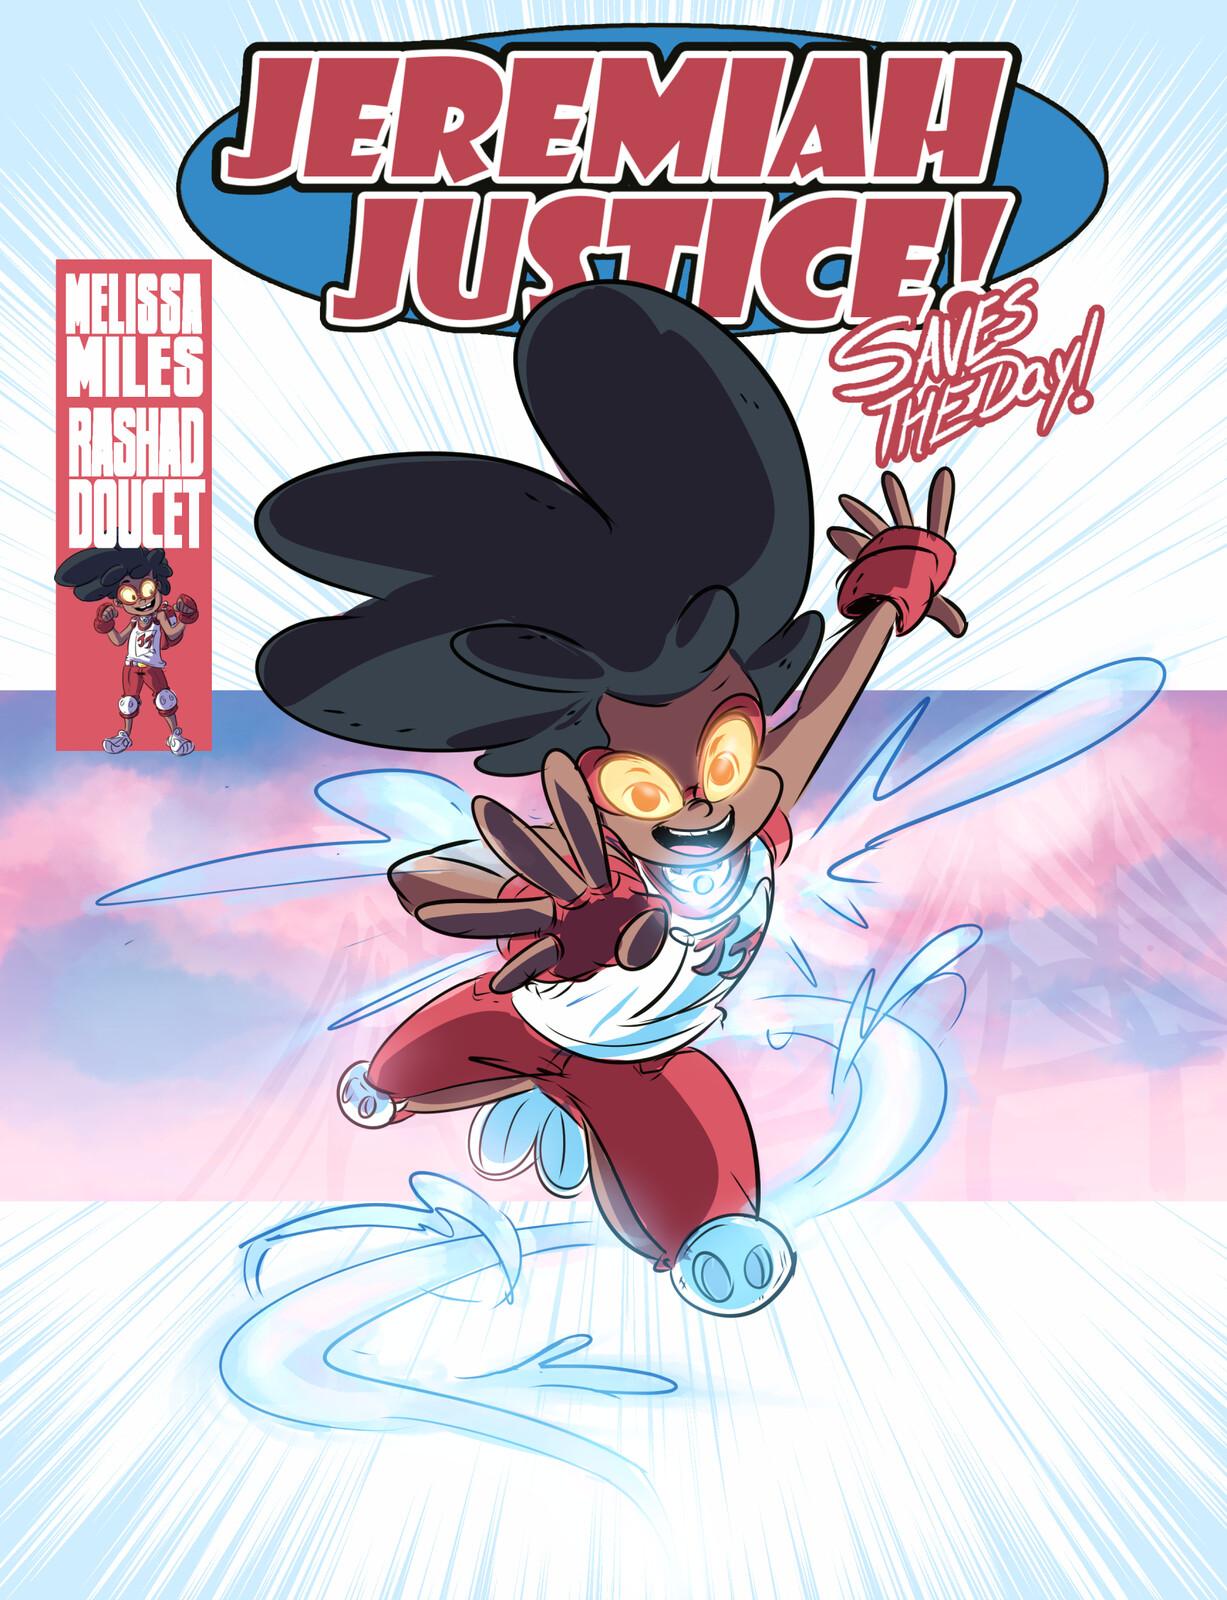 Jeremiah Justice